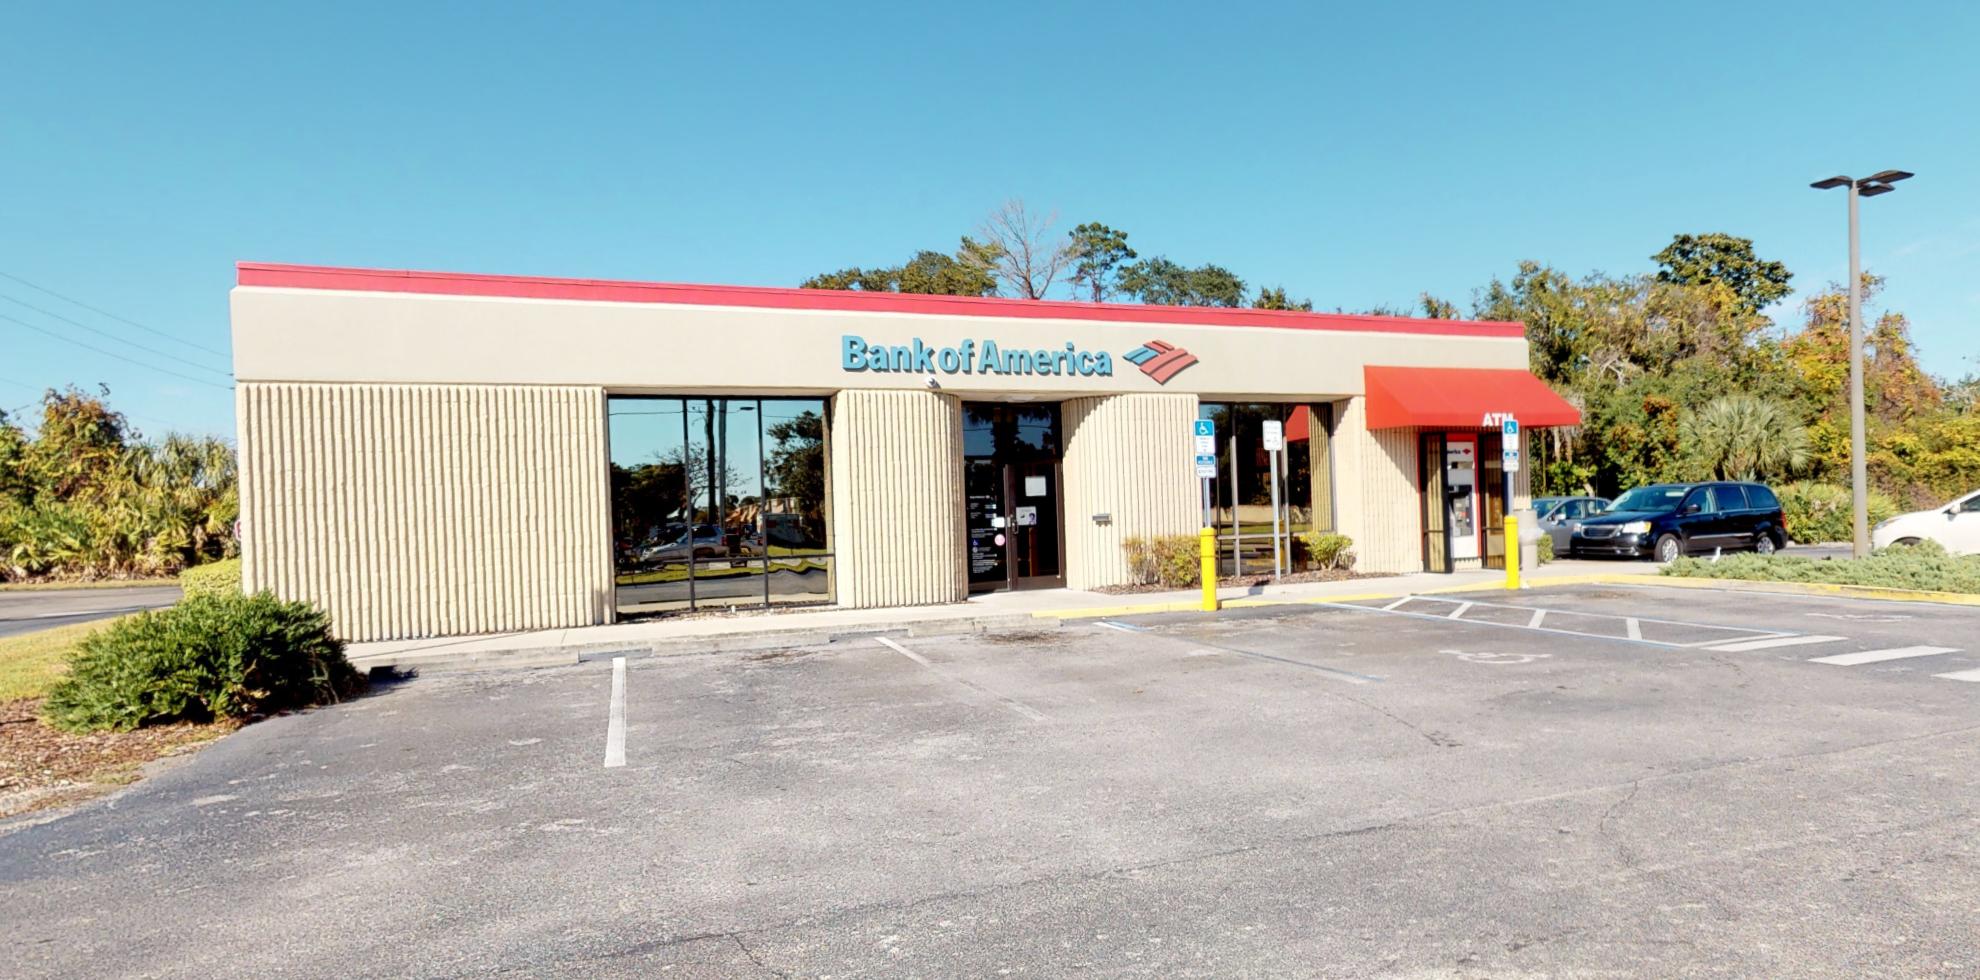 Bank of America financial center with drive-thru ATM   699 S Nova Rd, Ormond Beach, FL 32174